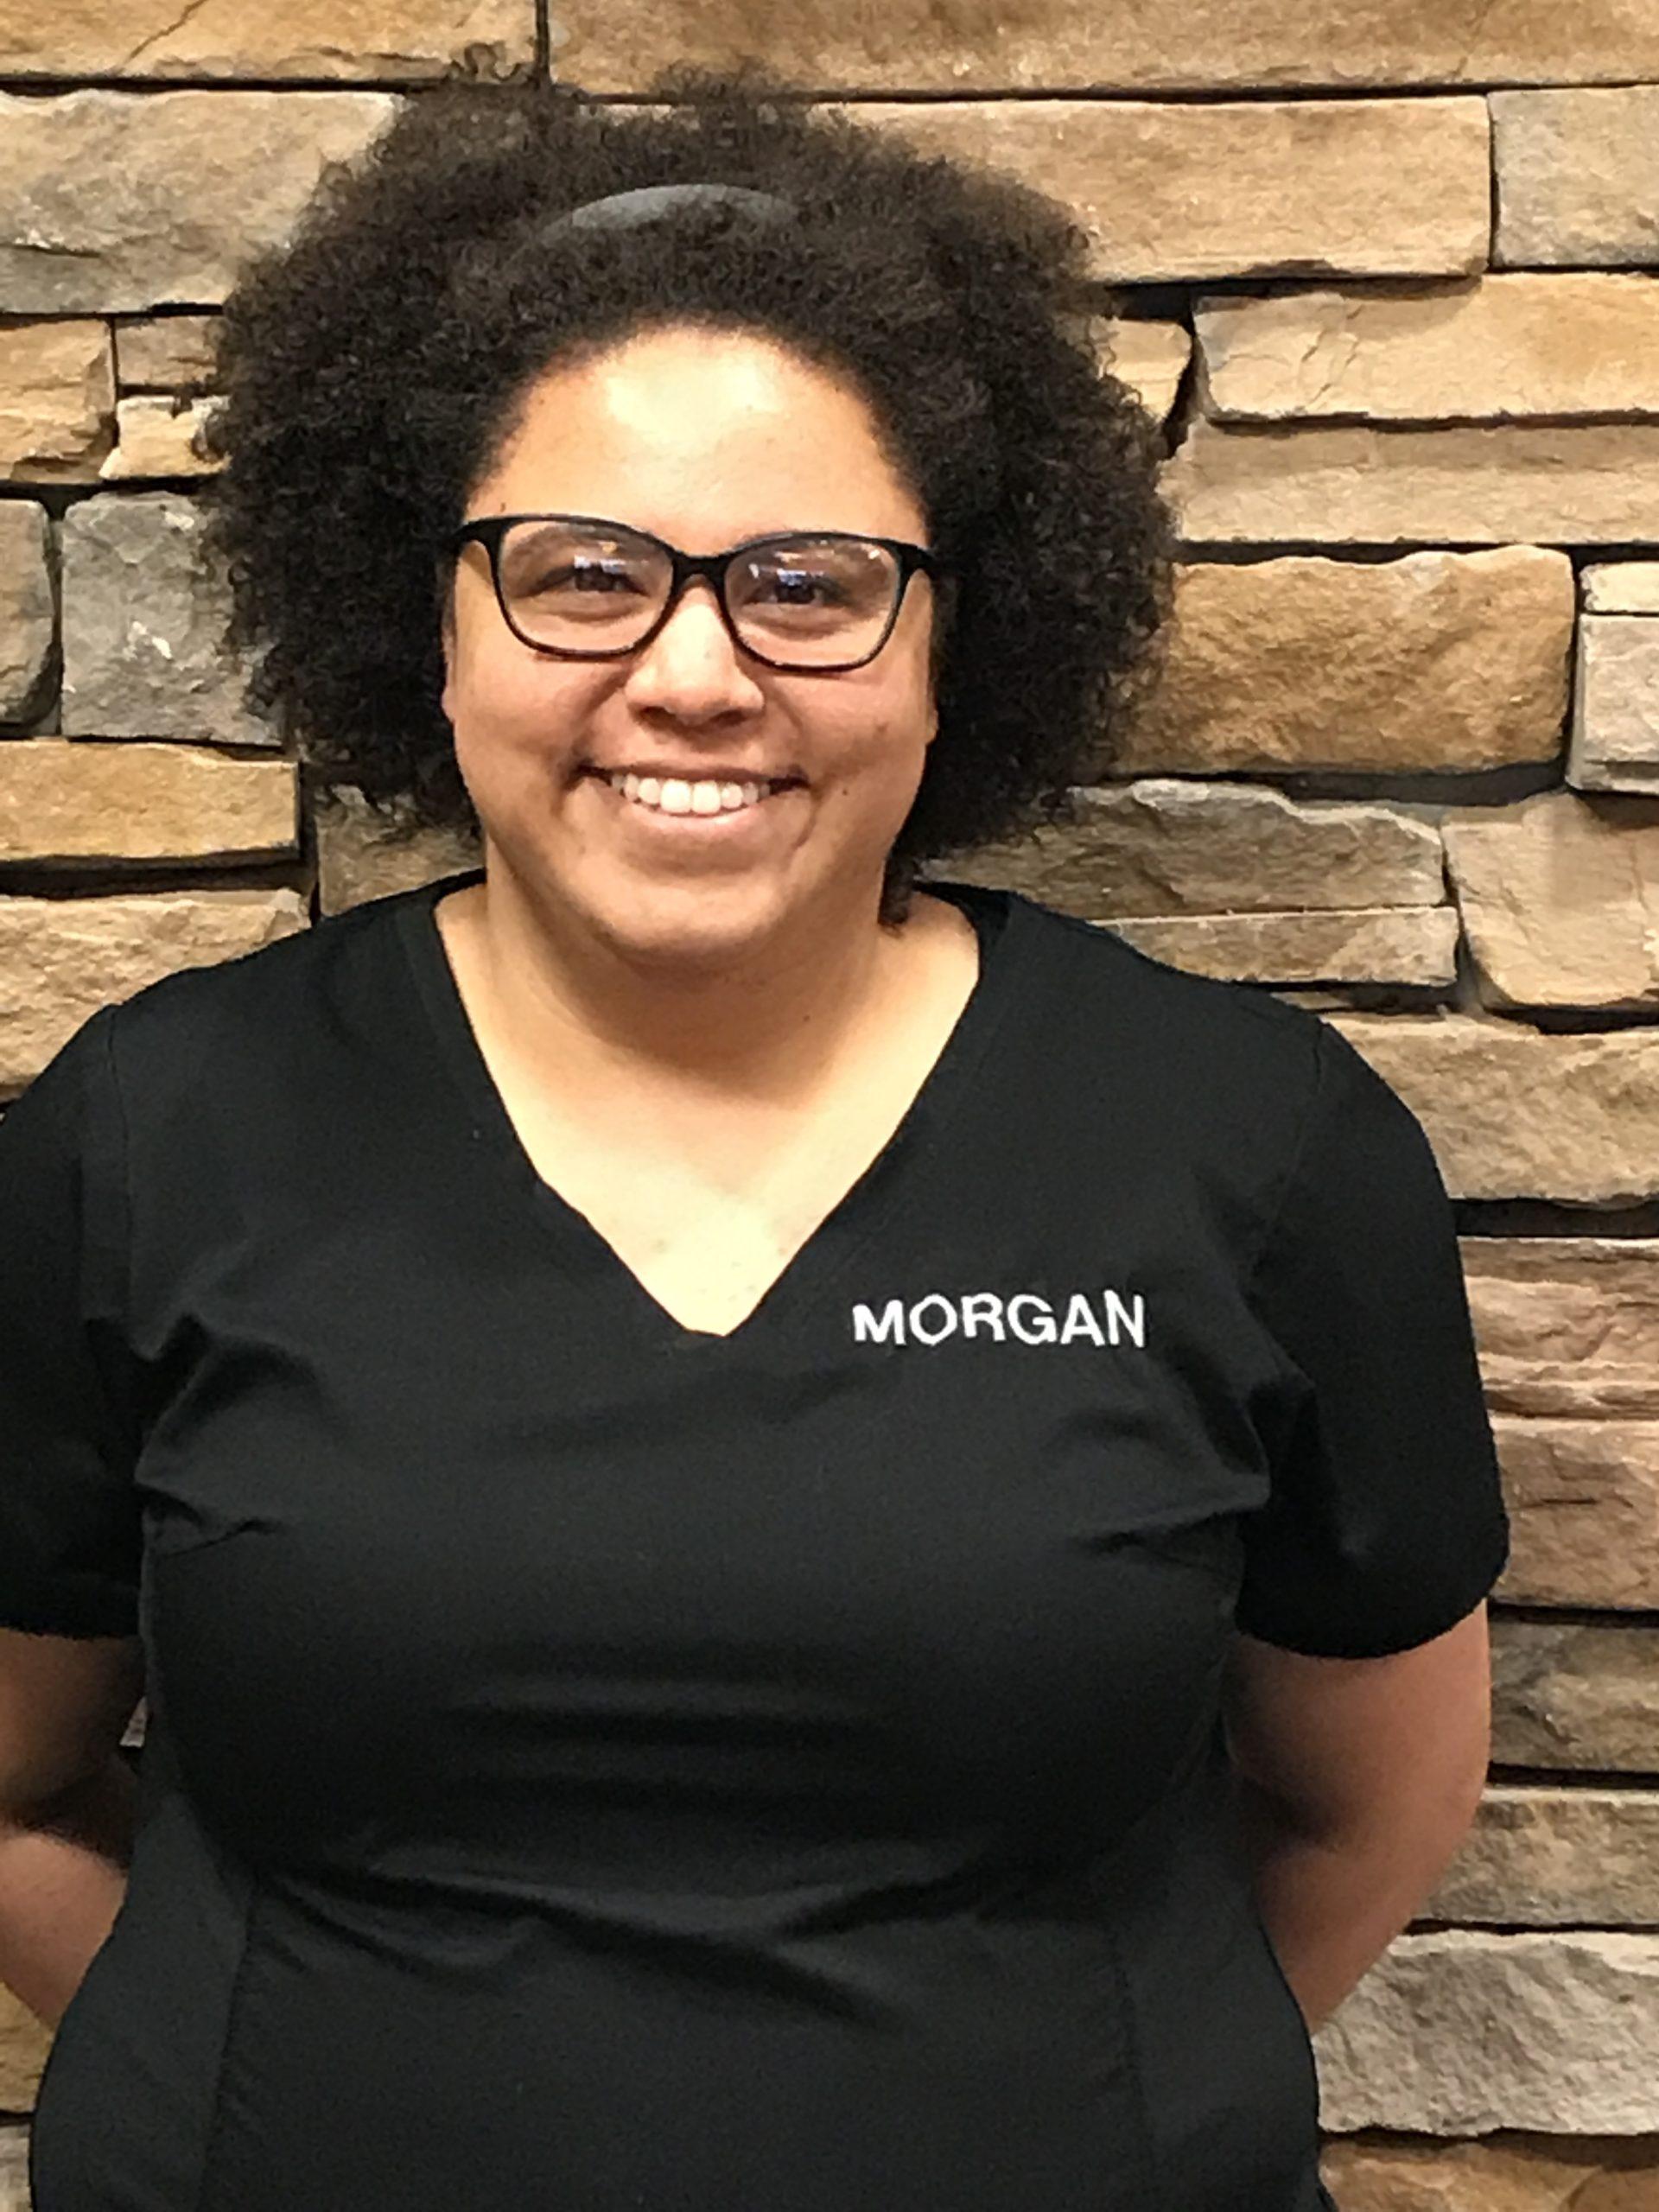 Morgan - Proctology employee